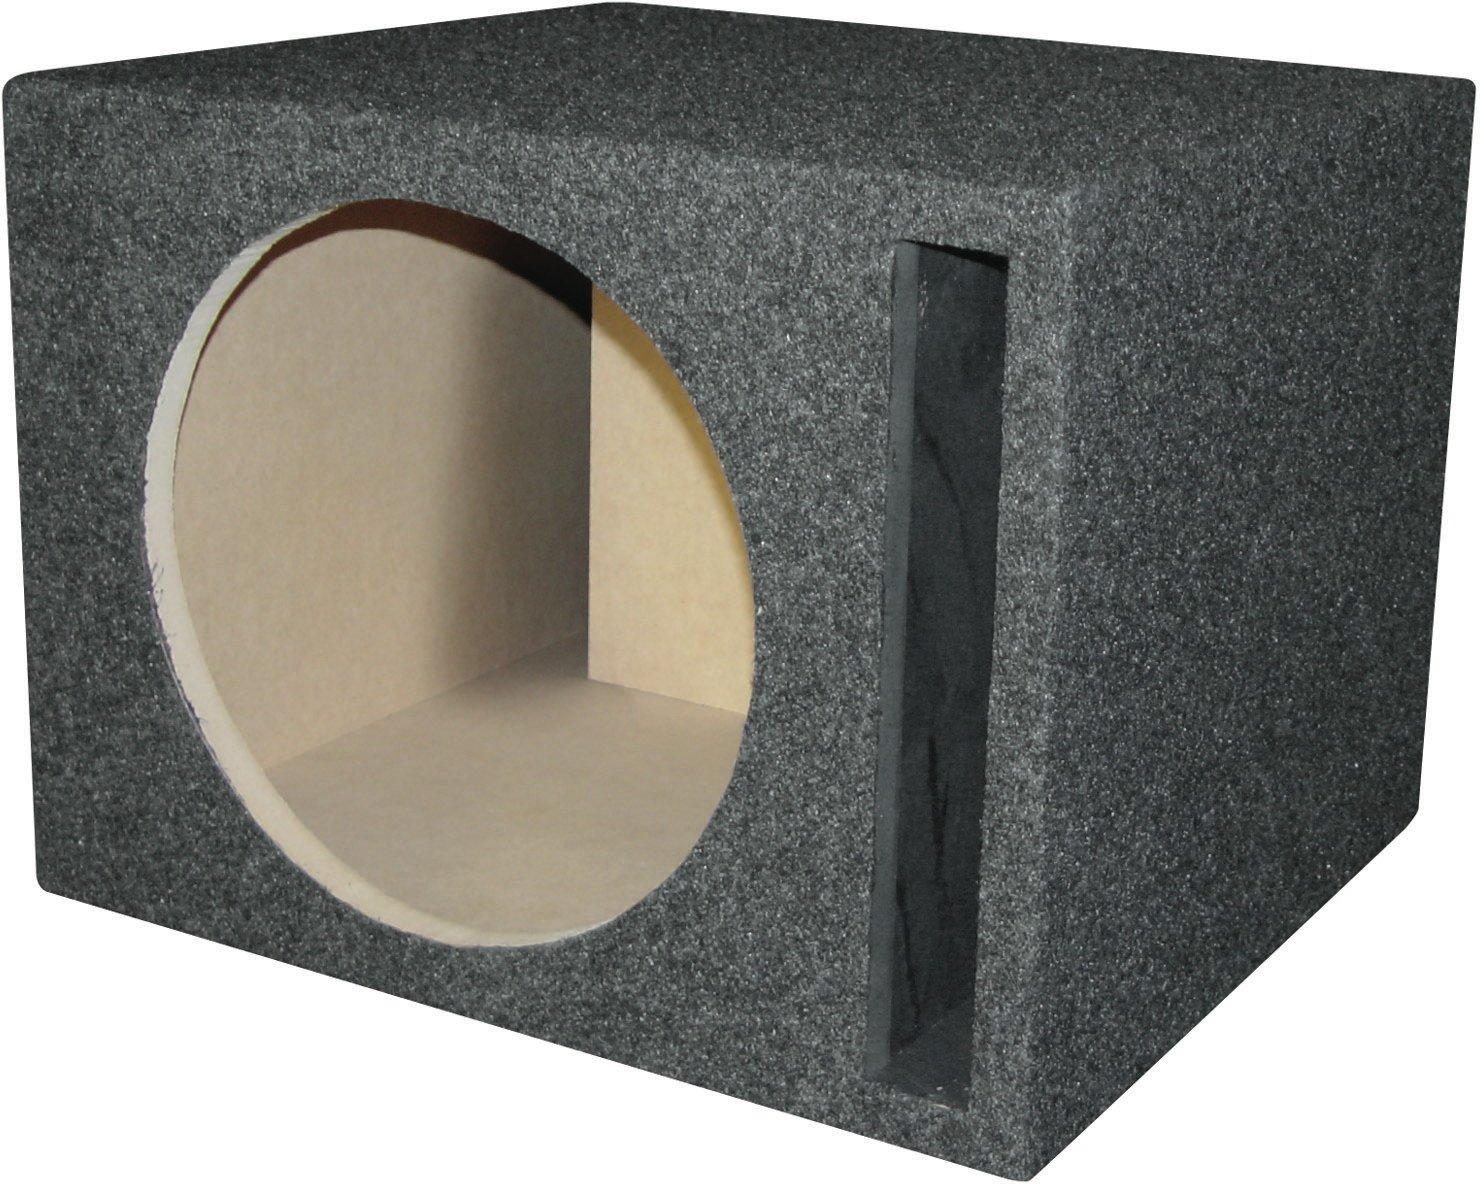 Amazon.com R/T 300 Enclosure Series -318-12 Alpine - Single 12-Inch Slot Vented Sub Bass Hatchback Speaker Box with Labyrinth Power Port for Alpine Subs ...  sc 1 st  Amazon.com & Amazon.com: R/T 300 Enclosure Series -318-12 Alpine - Single 12 ... Aboutintivar.Com